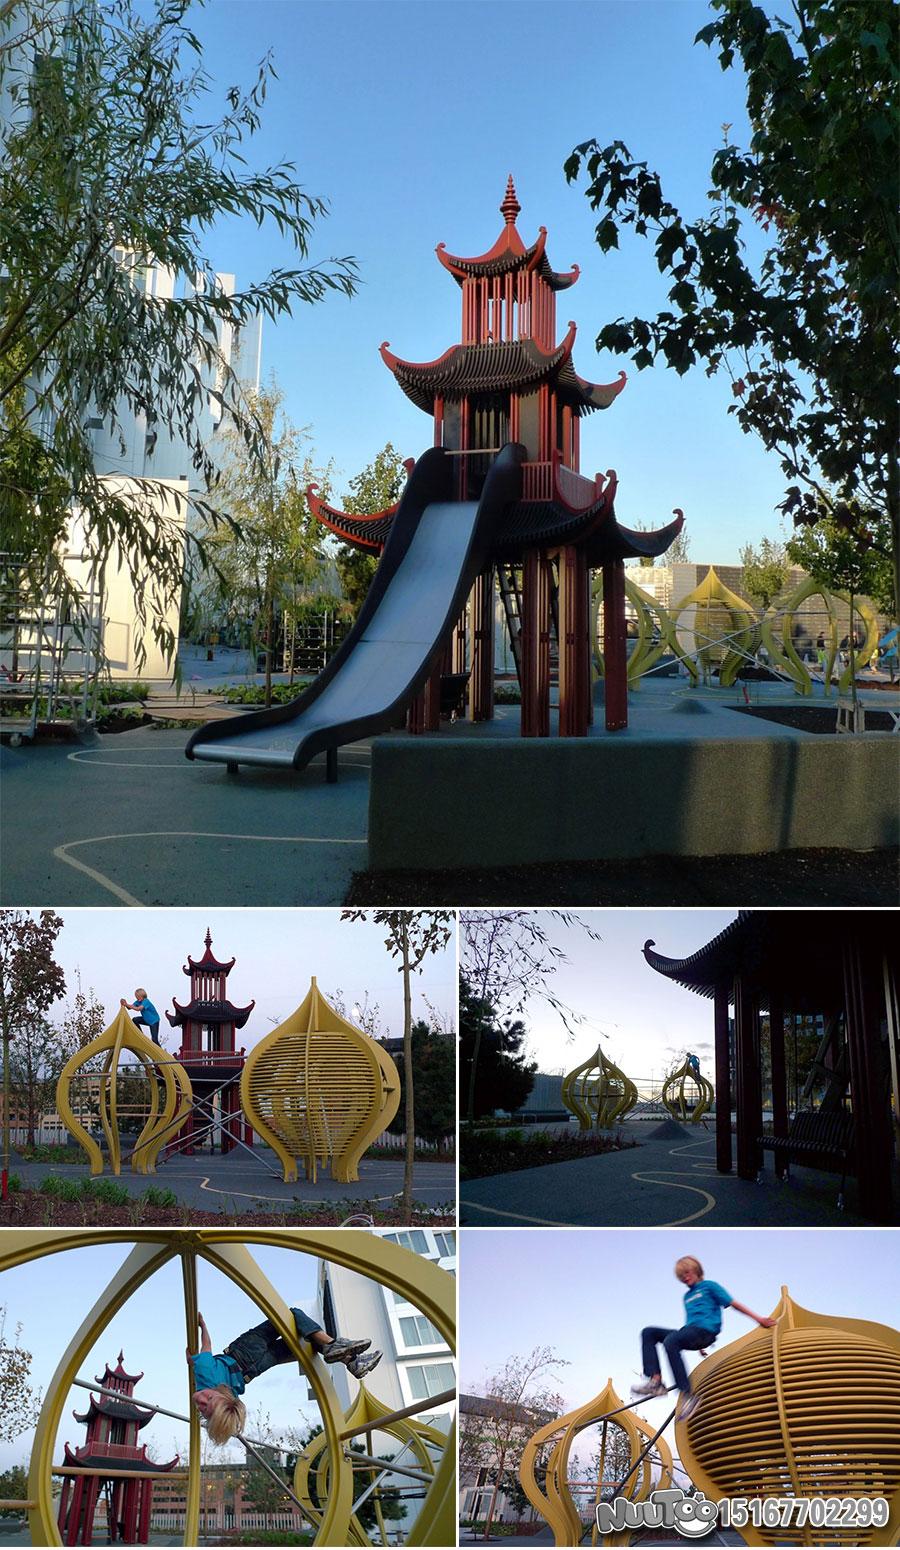 Non-standard amusement + personalized playground + amusement equipment + rides + outdoor children's play facilities _06